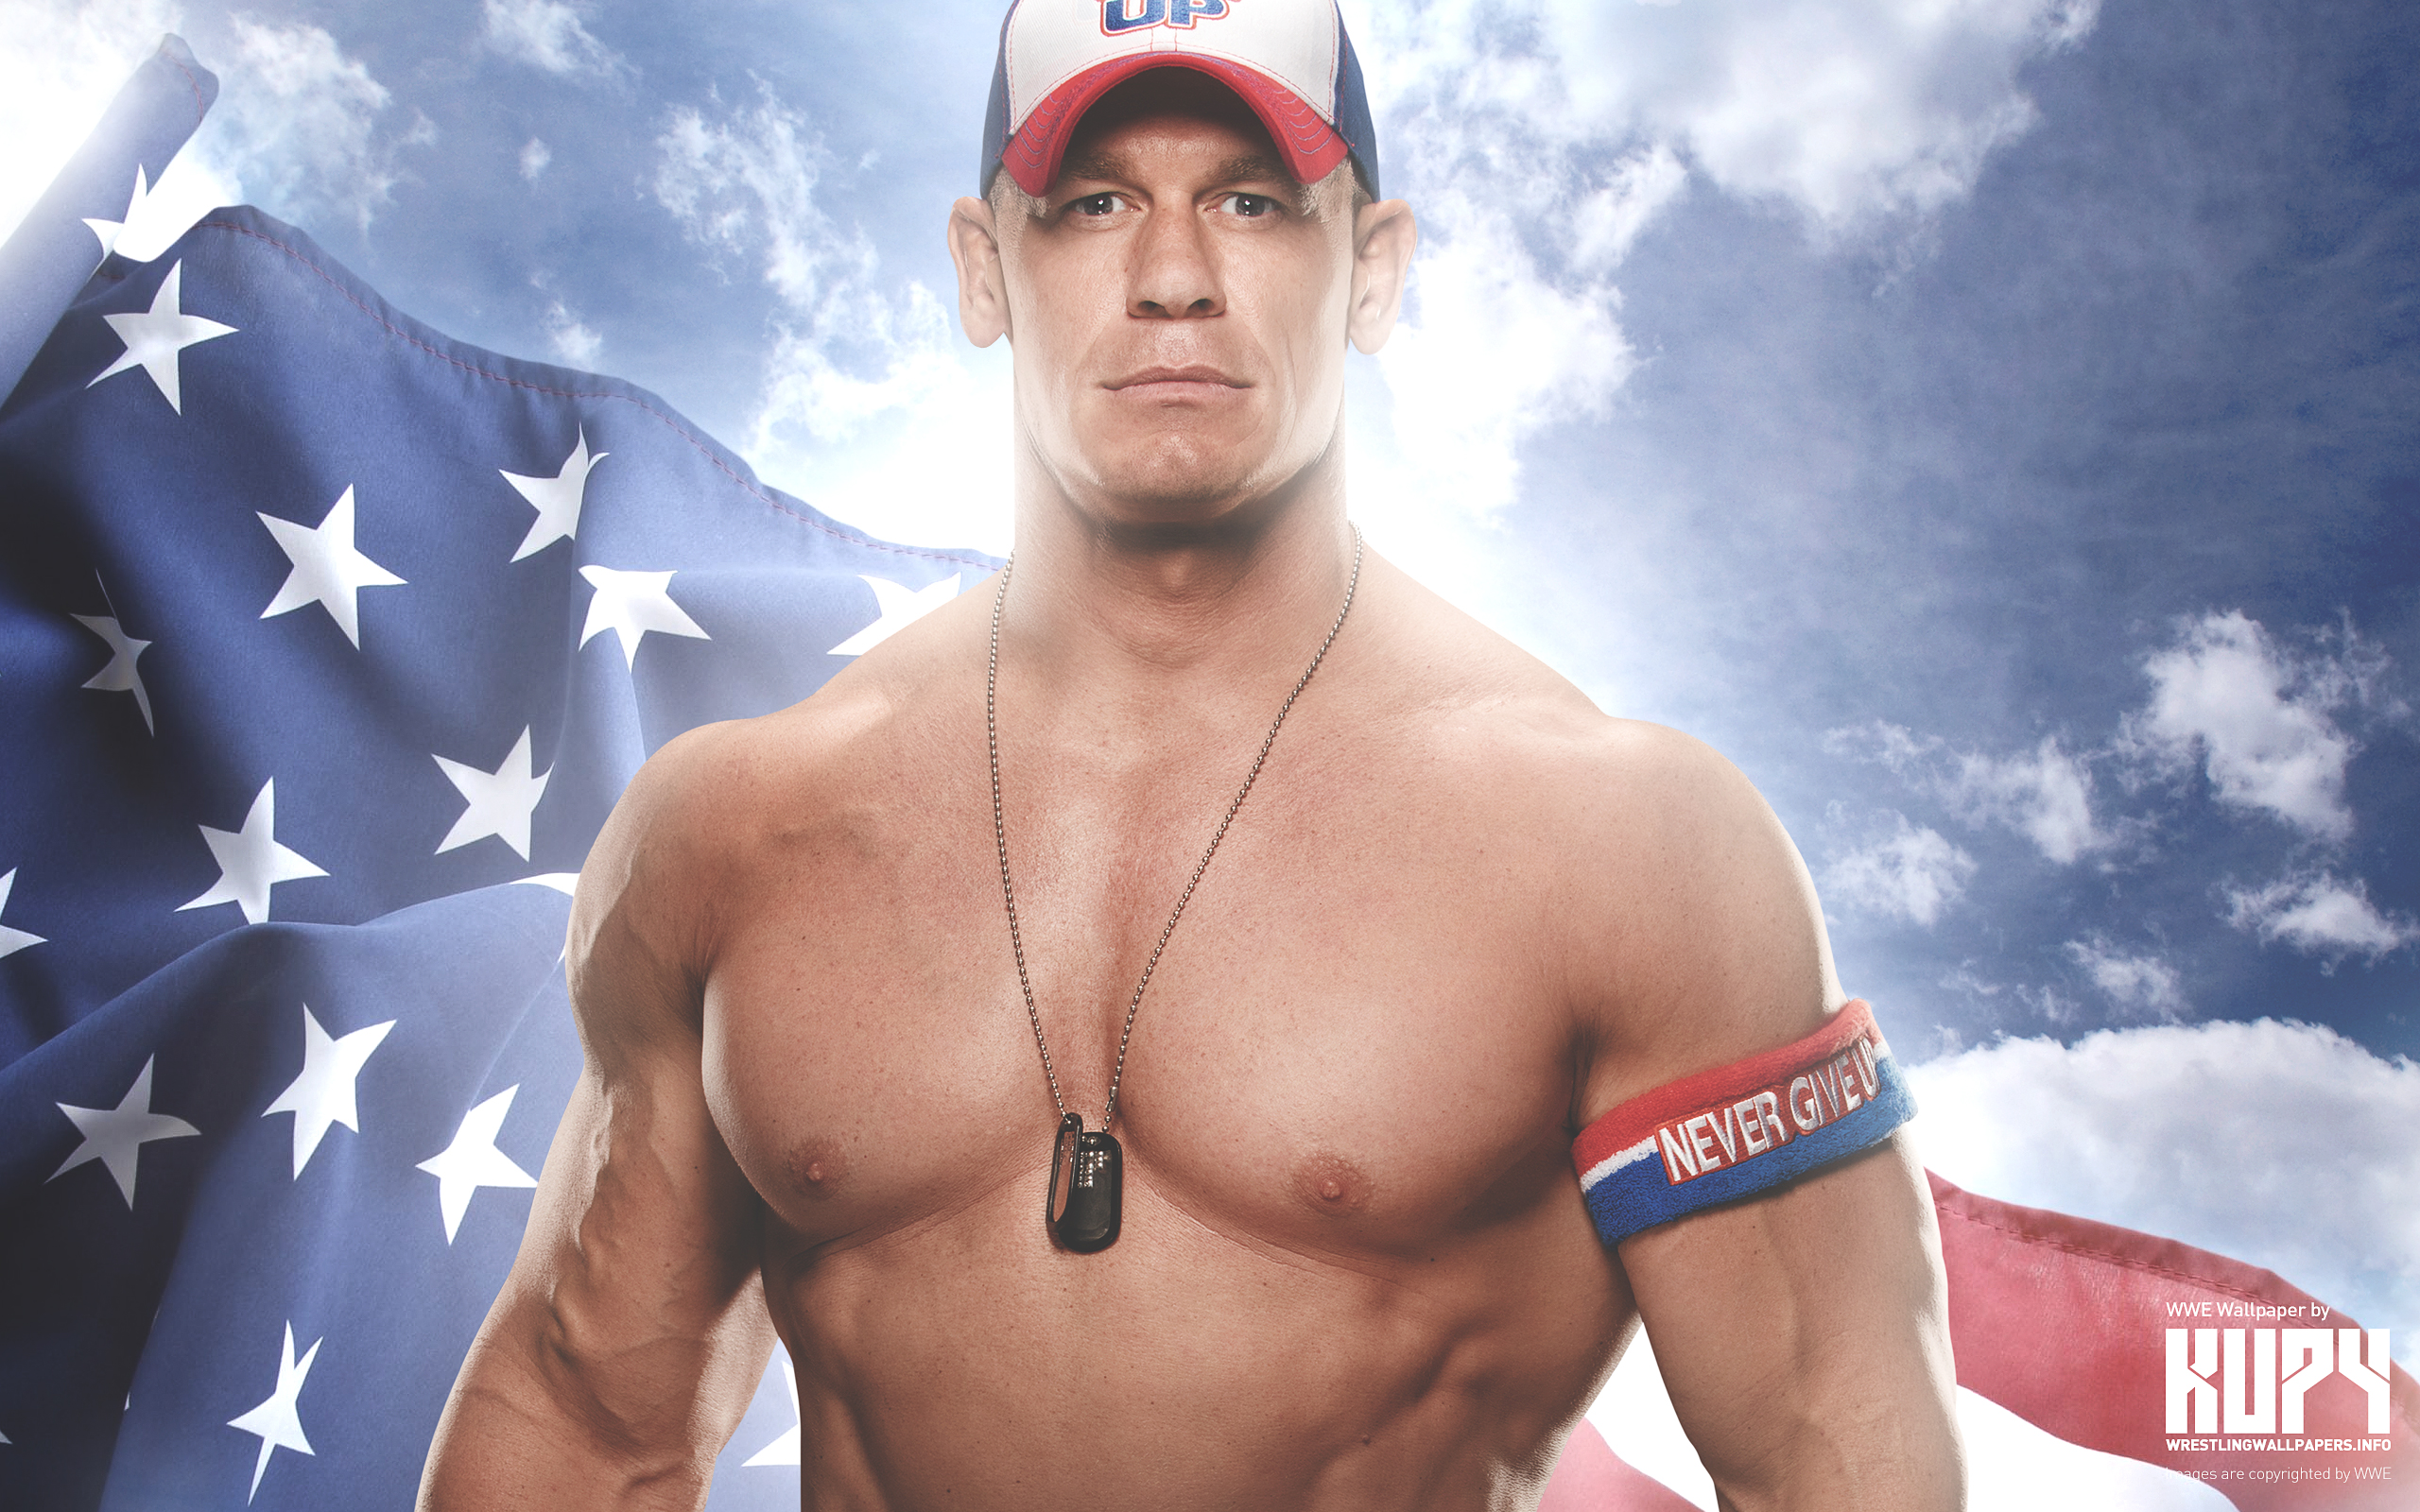 NEW John Cena 2016 Wallpaper